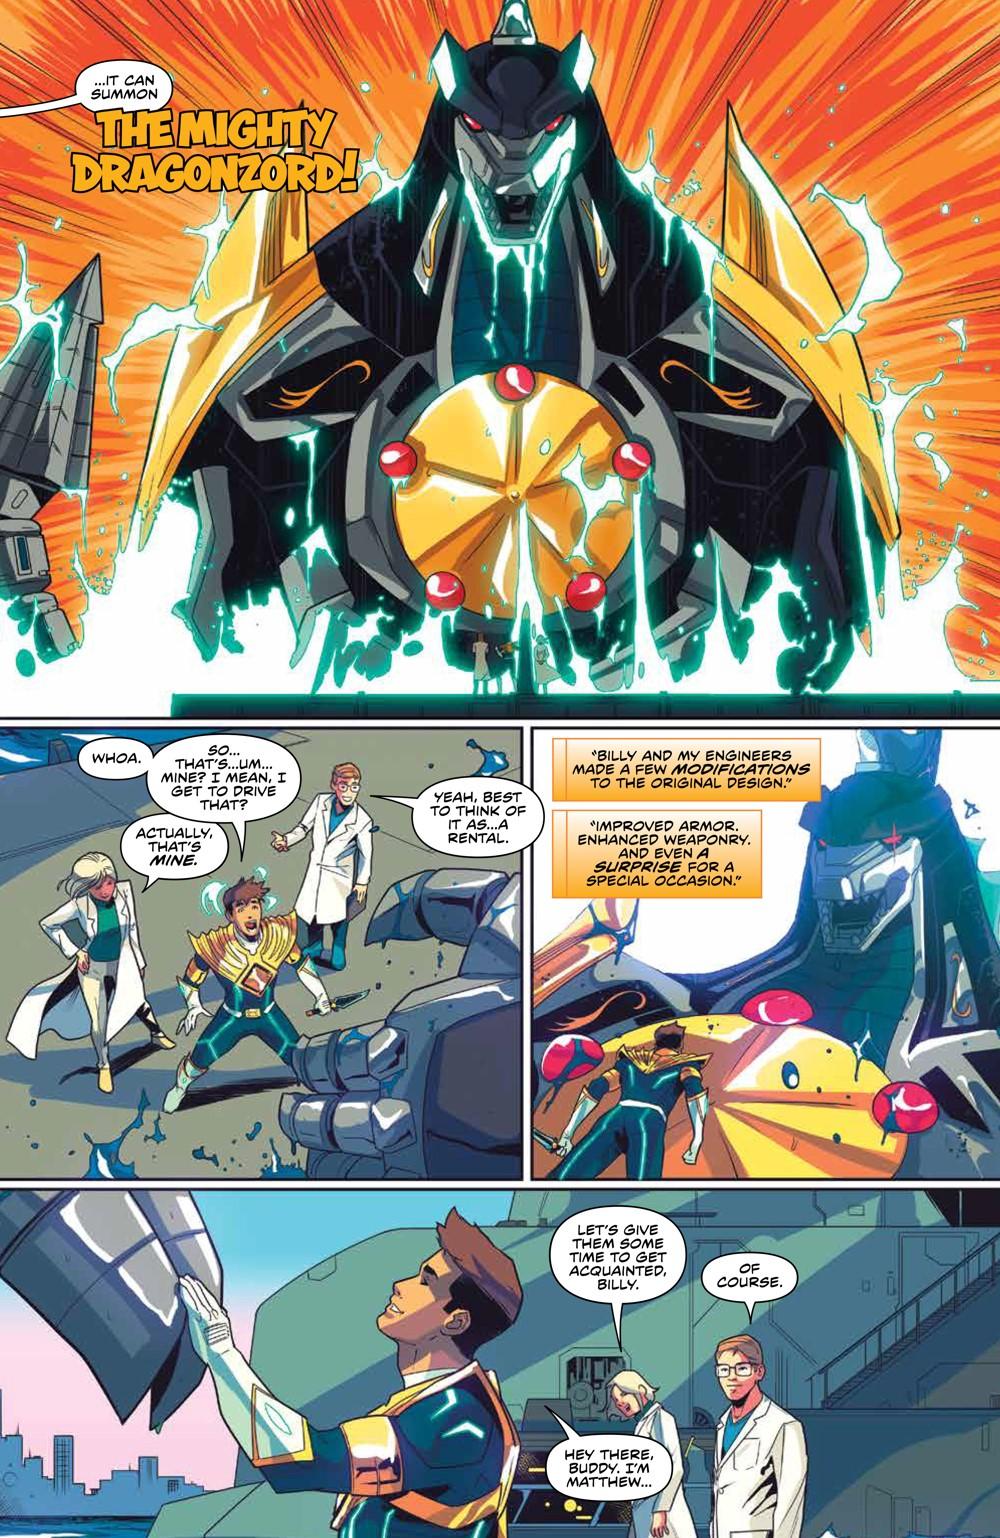 MightyMorphin_v2_SC_PRESS_20 ComicList Previews: MIGHTY MORPHIN VOLUME 2 TP